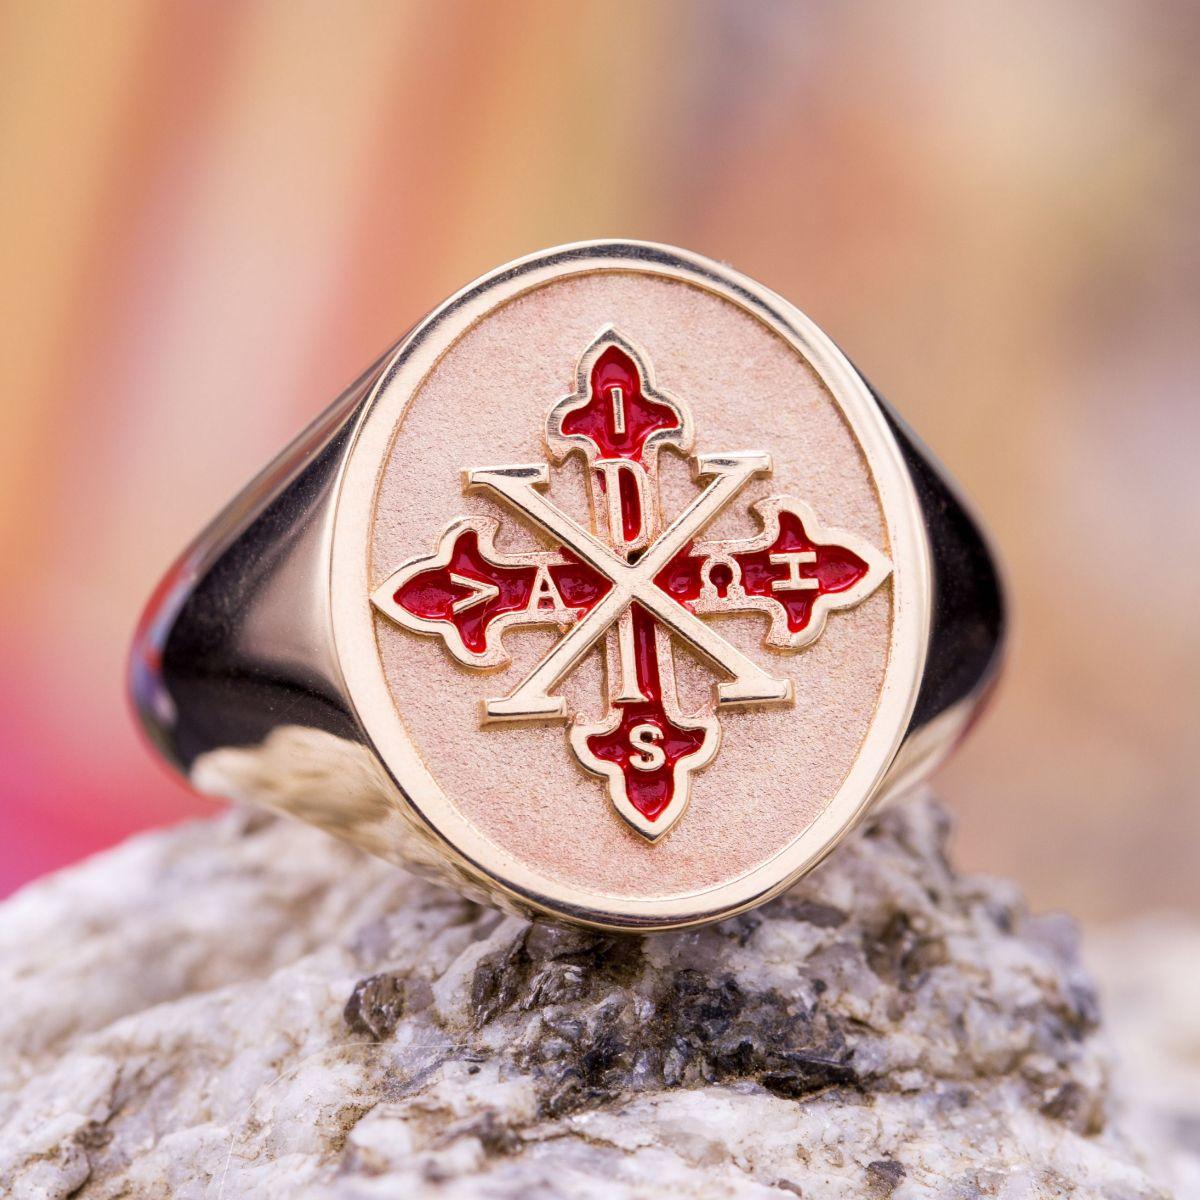 Custom Signet Rings, Family Crest Rings & Coat of Arms Rings ...